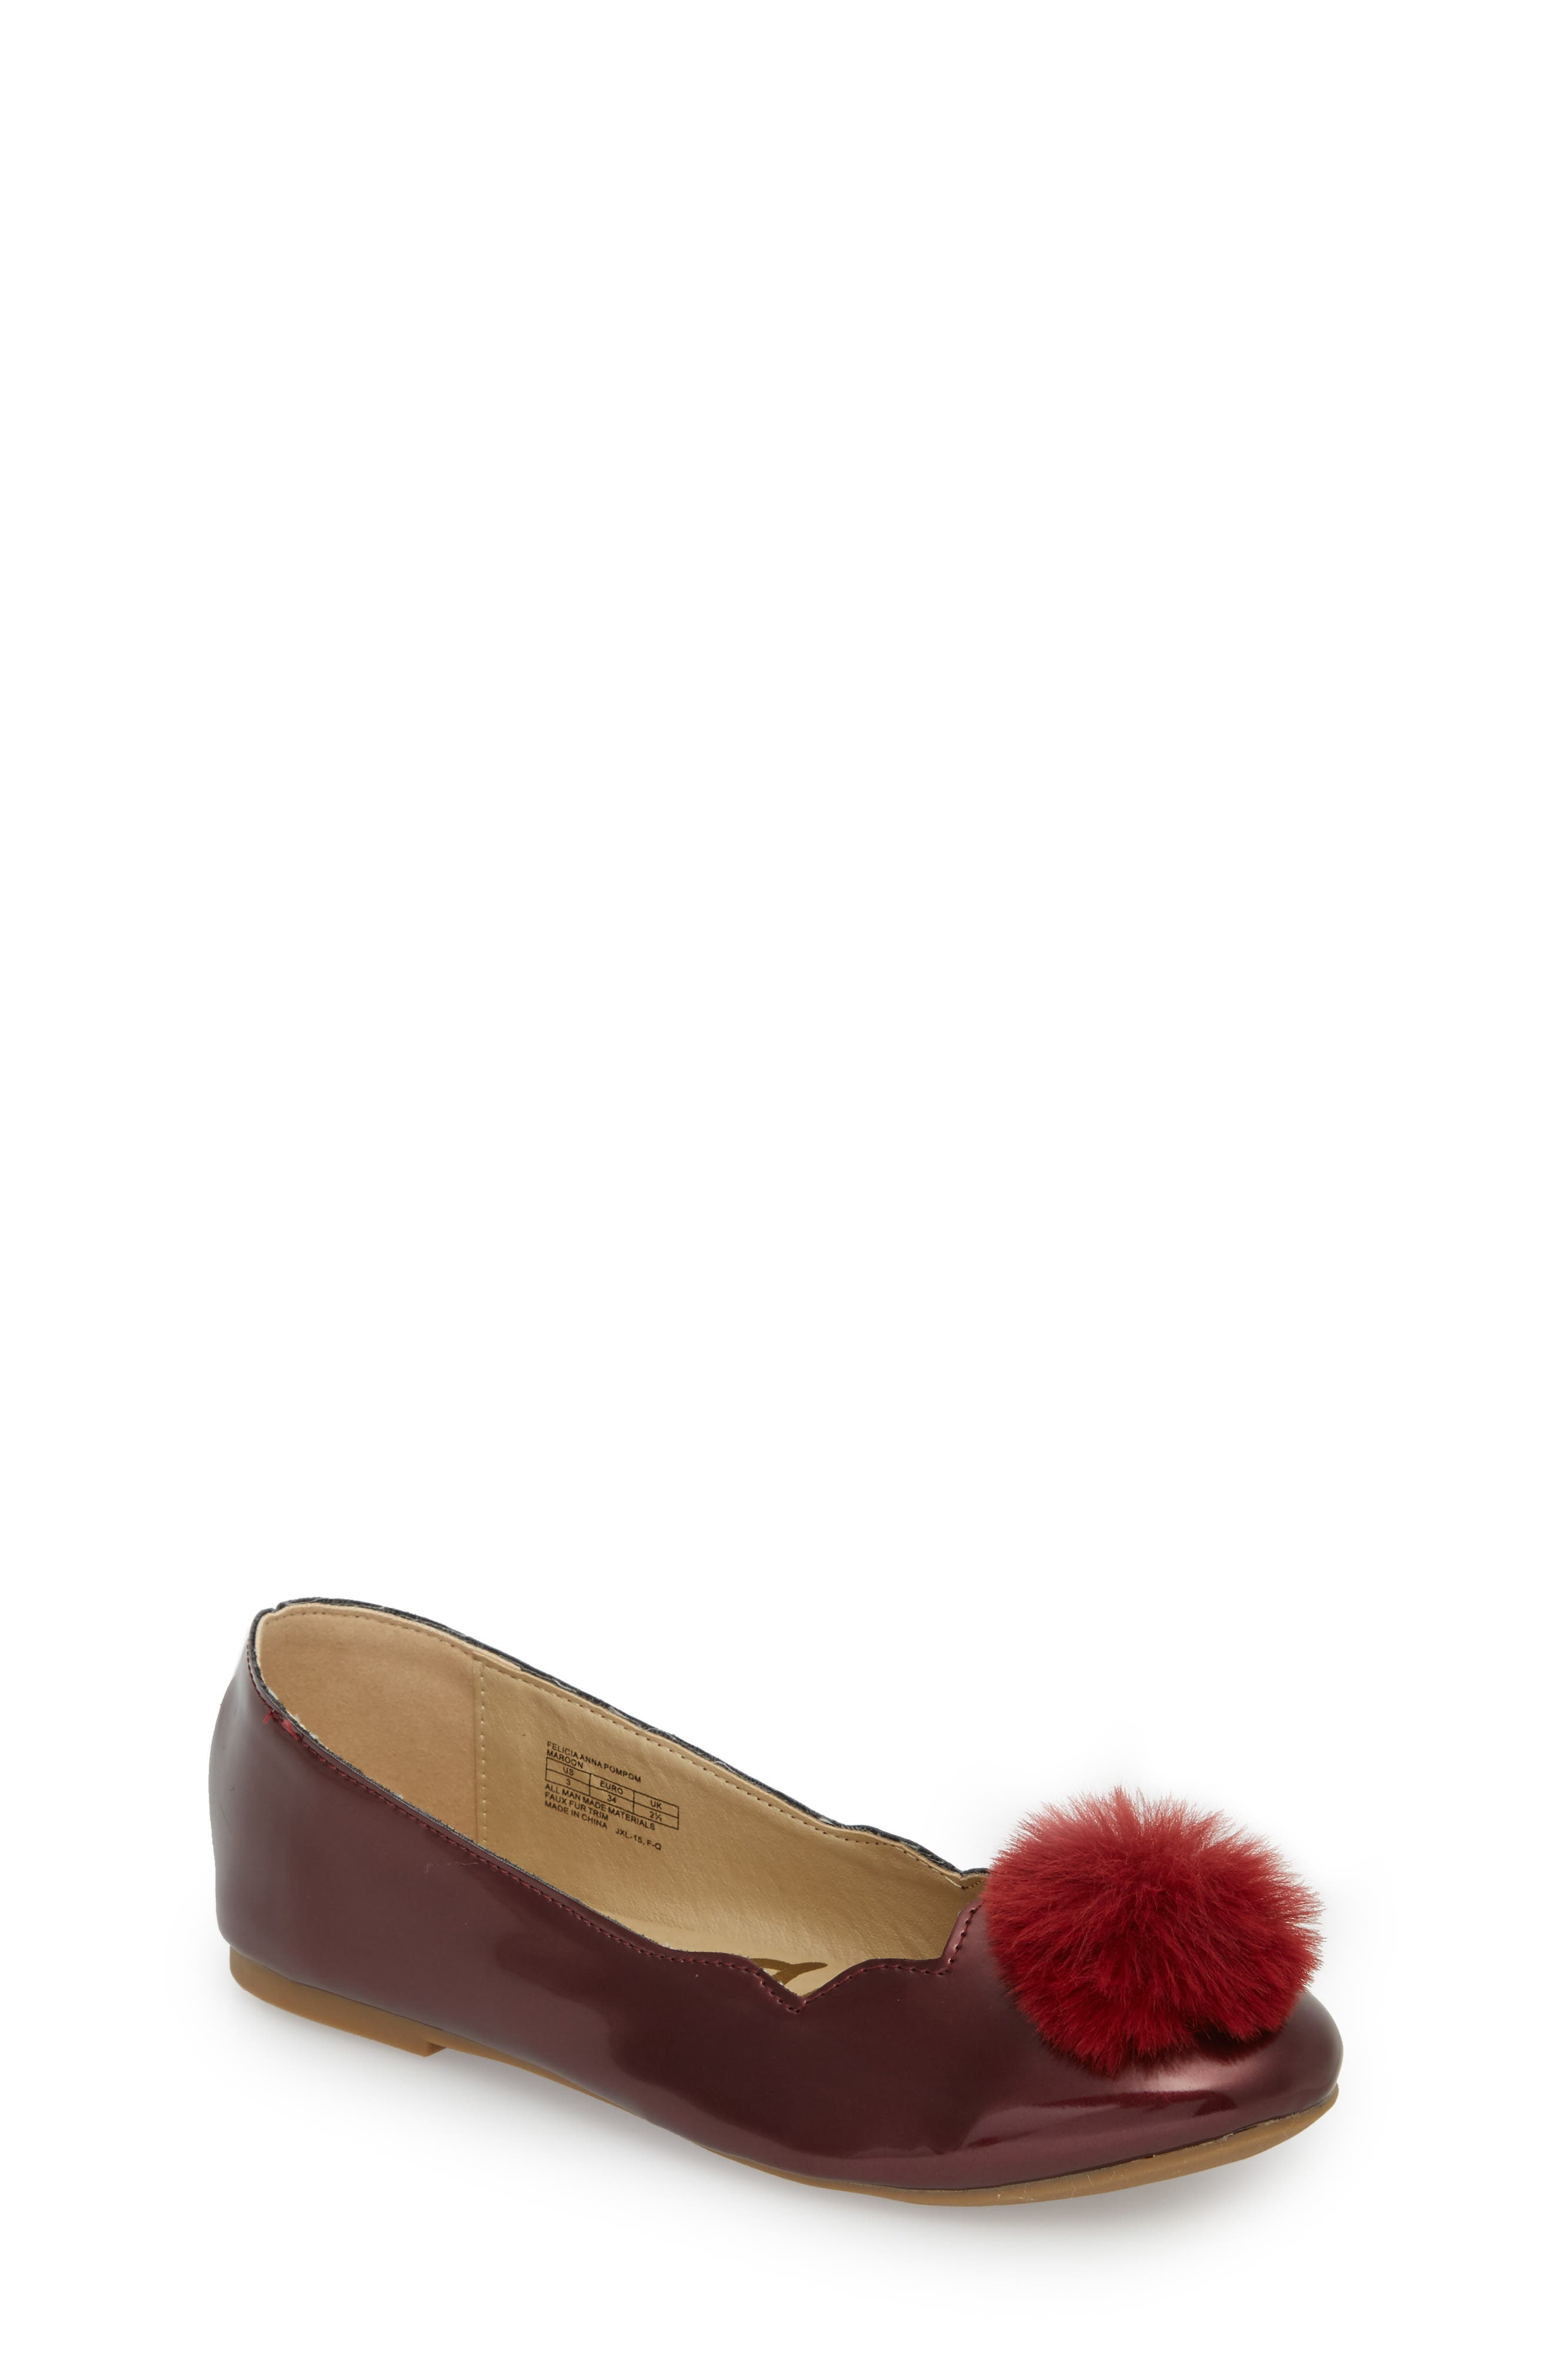 Felicia Anna Faux Fur Pom Flat,                             Main thumbnail 1, color,                             Maroon